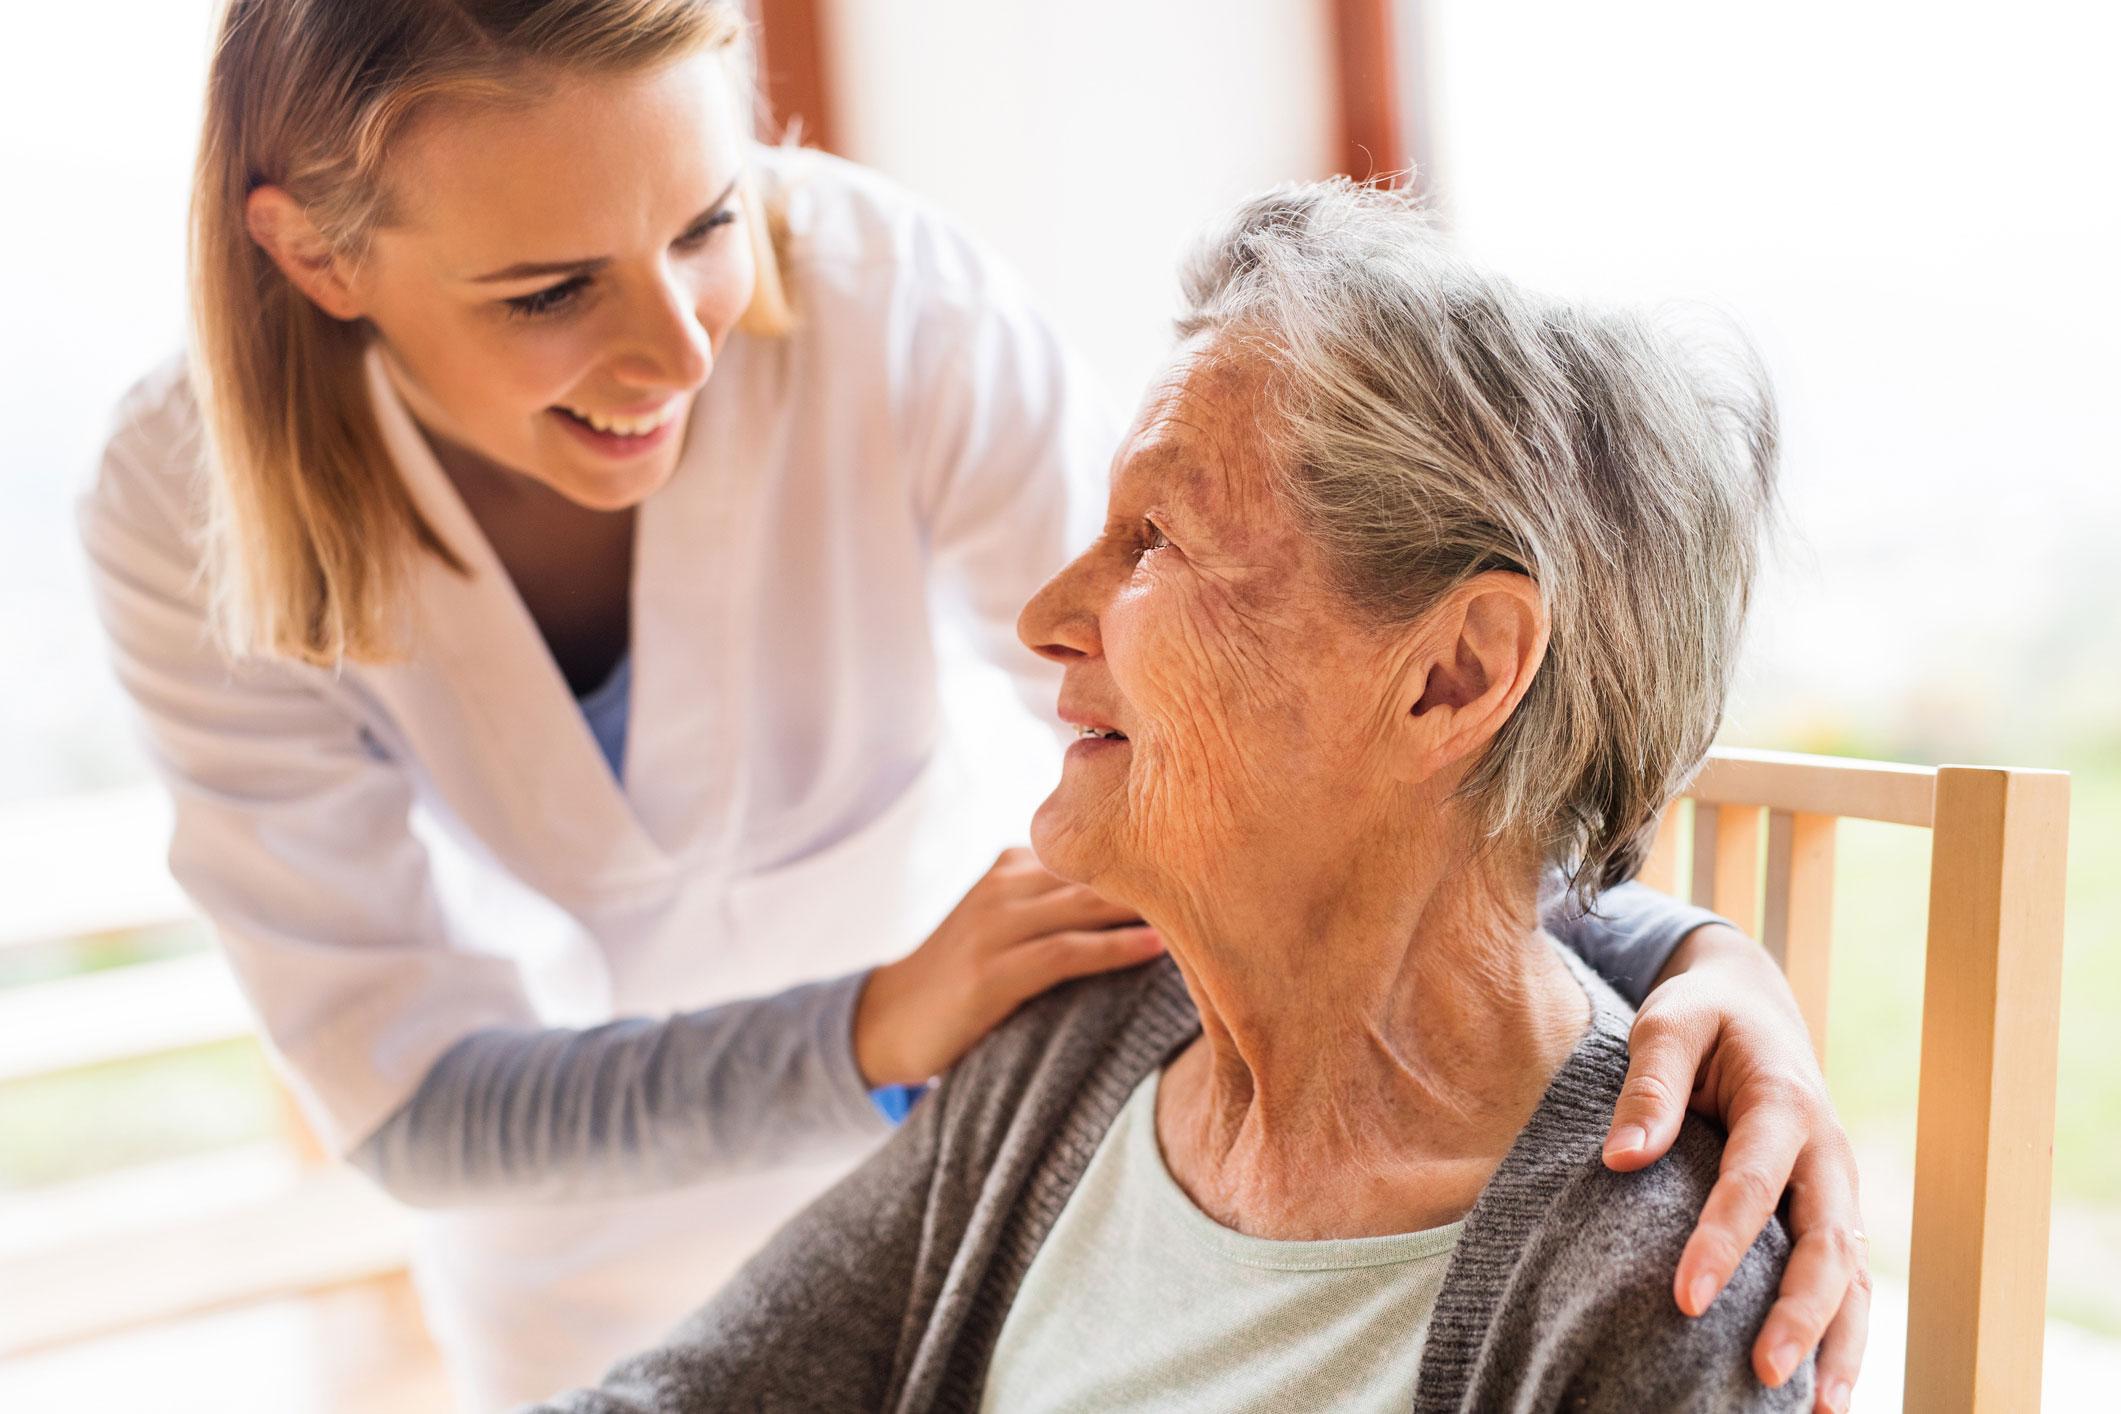 Patient Pflegeförderung - Förderungen